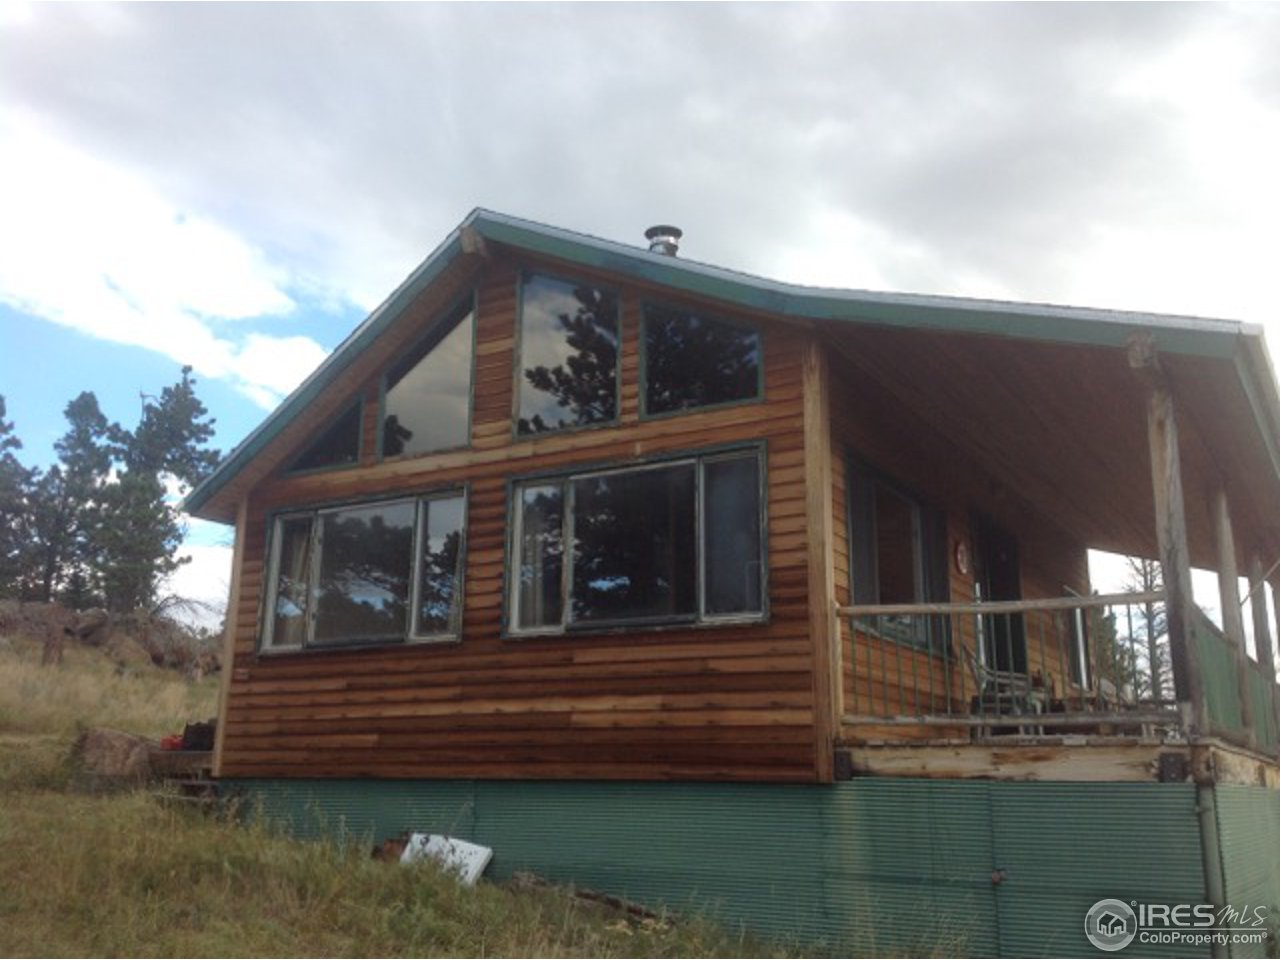 520 Snowshoe Ct, Livermore, CO 80536